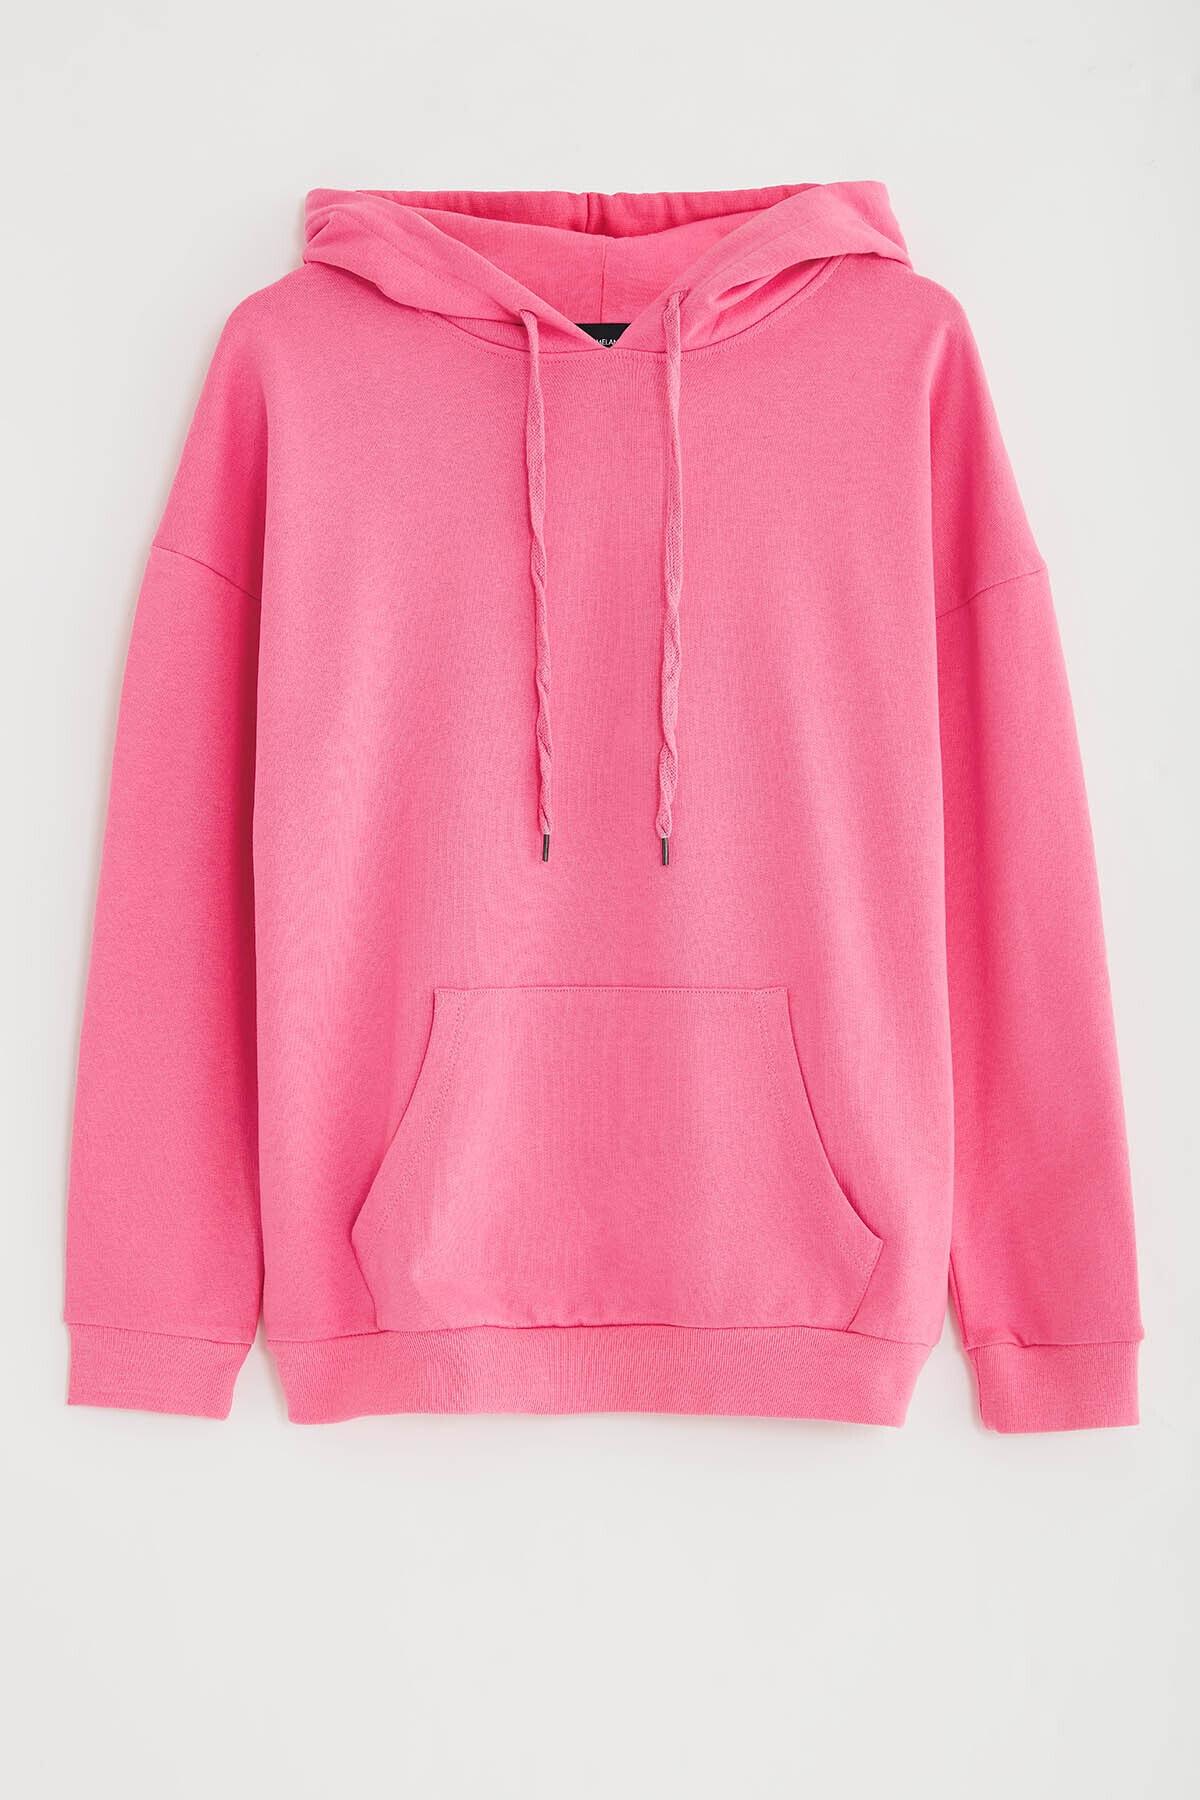 GRIMELANGE JANE Kadın Pembe Basic Kapüşonlu Sweatshirt 1